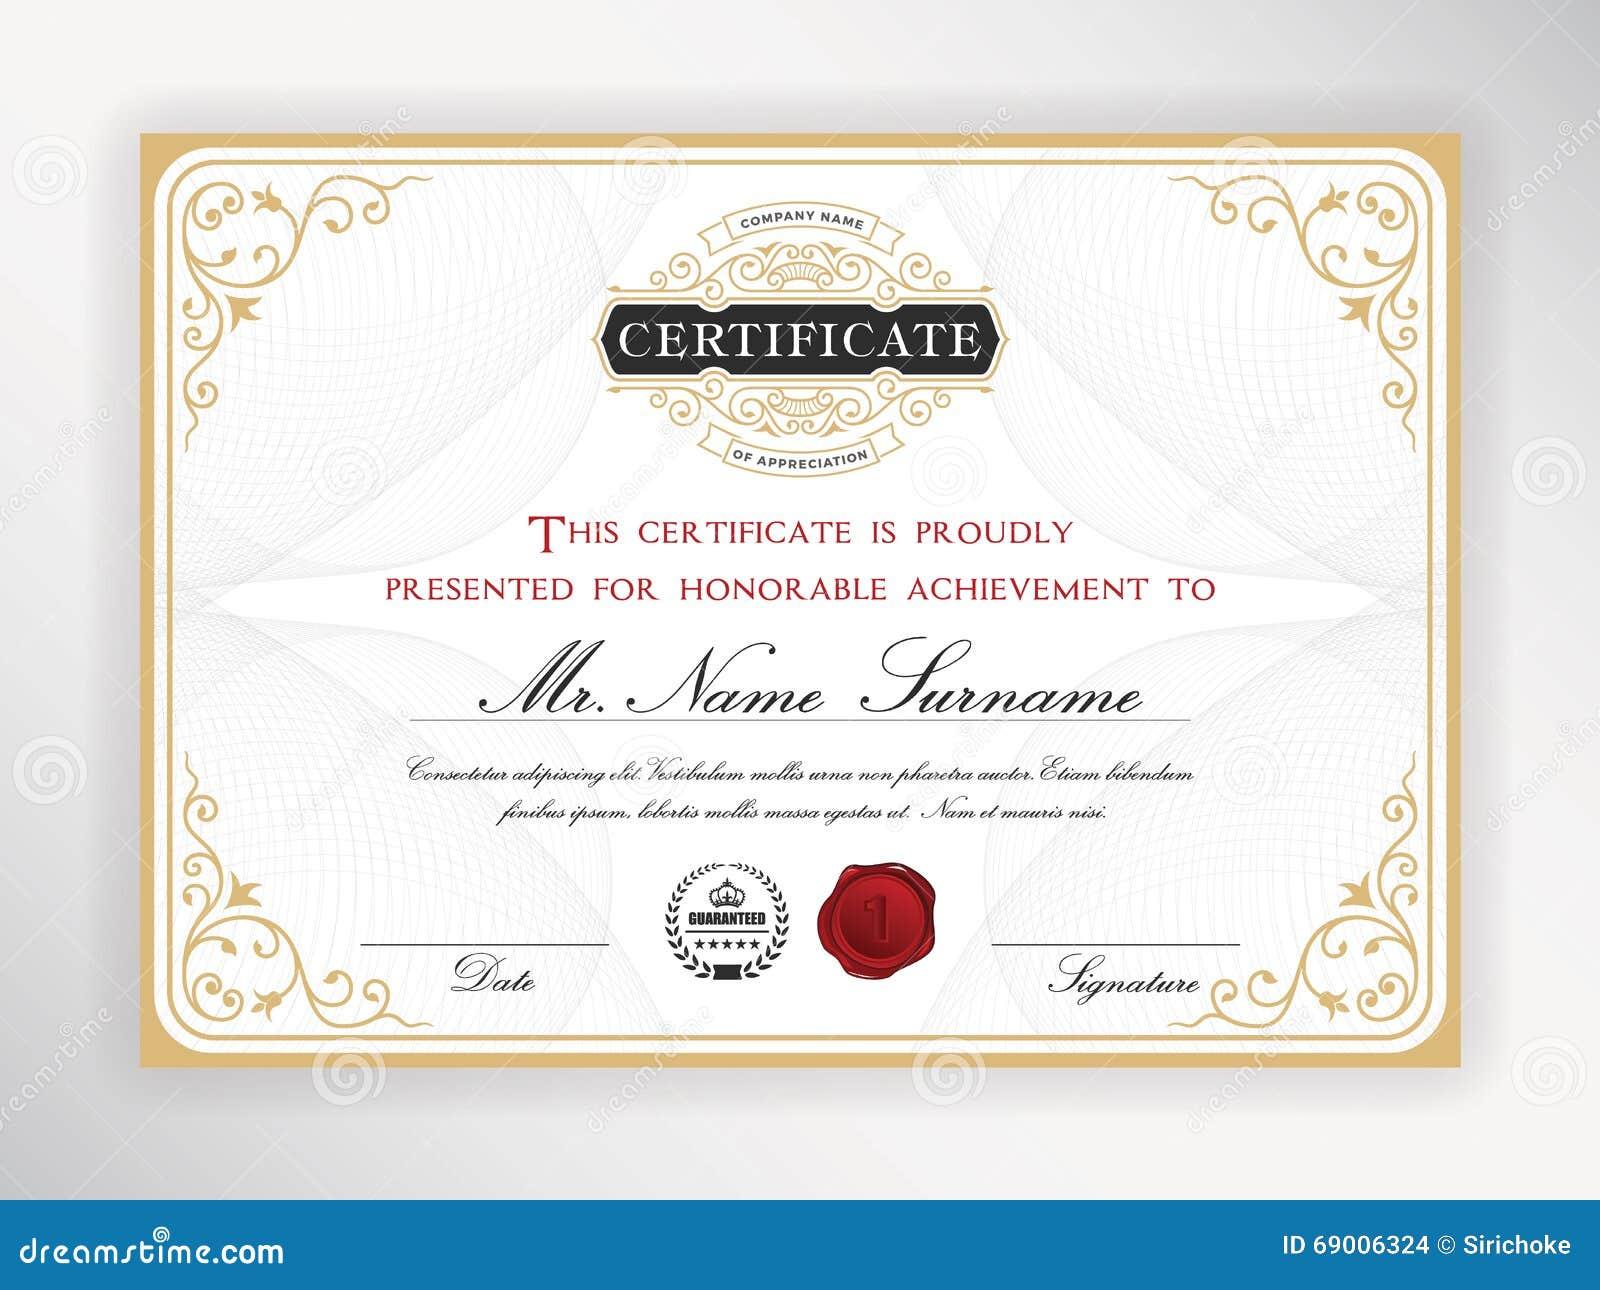 Elegant Certificate Template Stock Vector Illustration Of Elements